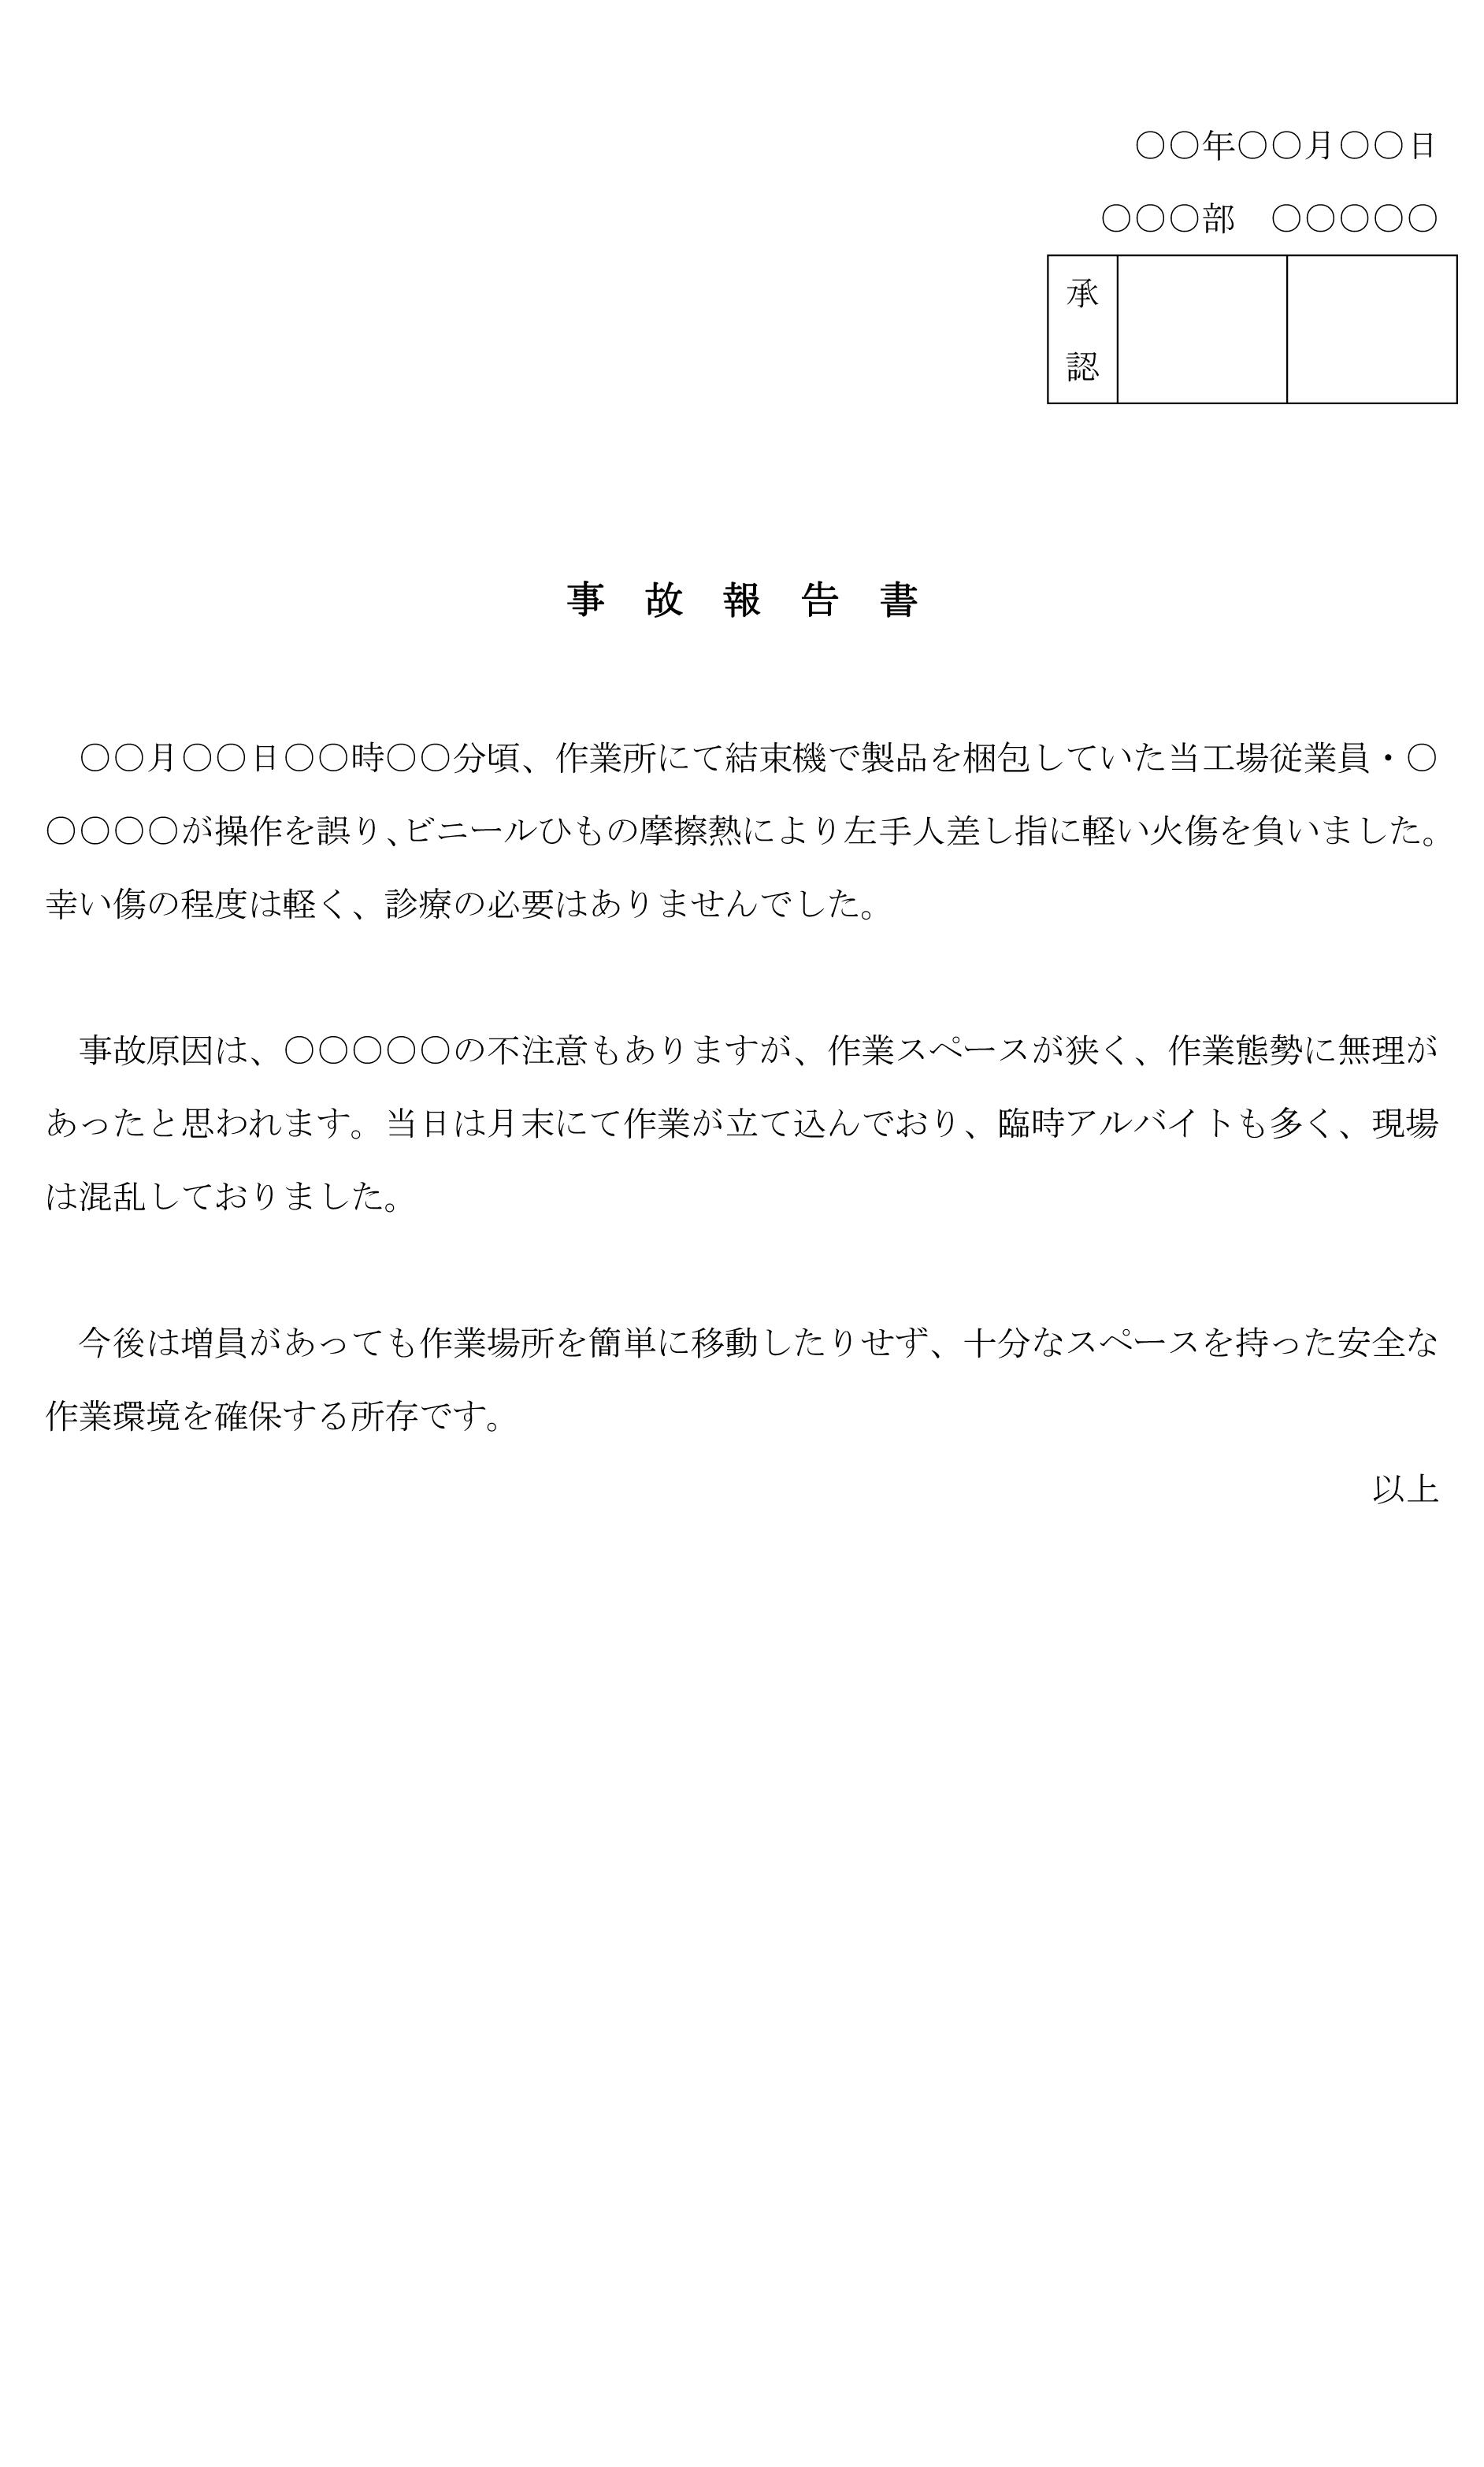 事故報告書02